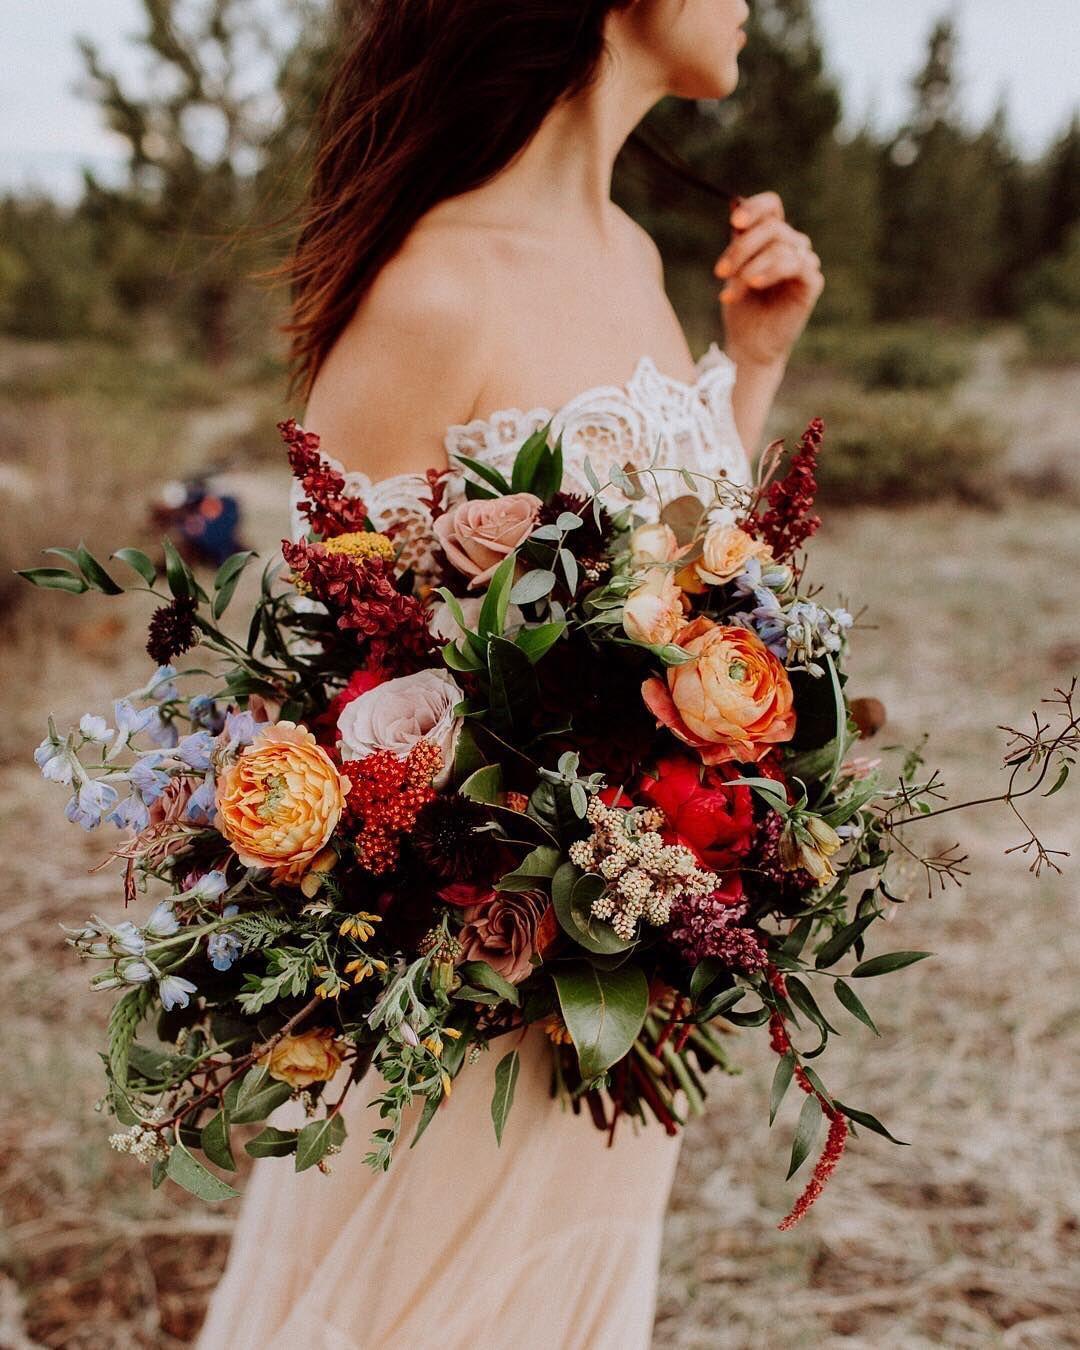 5 Autumnal Wedding Day Details, Inspired By Instagram